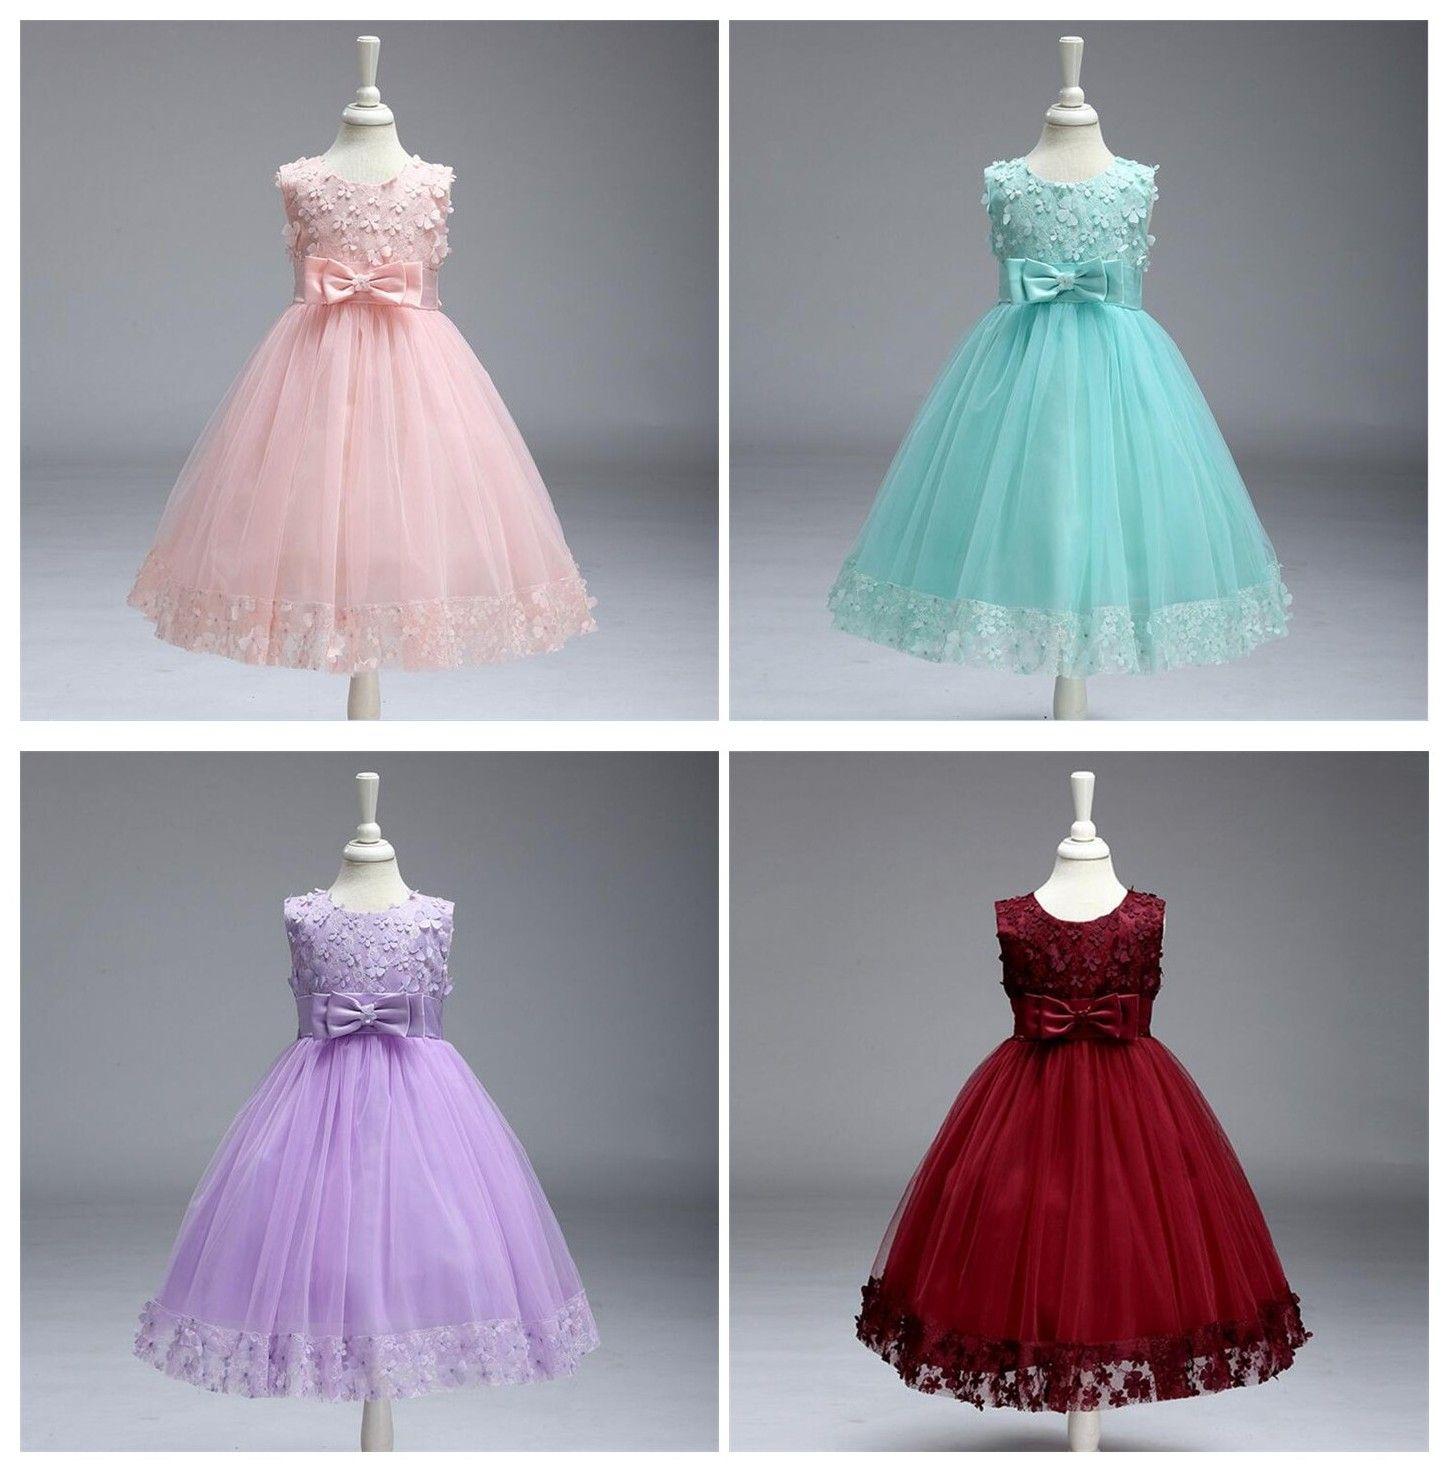 Kleidung Kinder Mädchen Elegante Blumen Großhandel Kinder Kleider b6gyYfv7